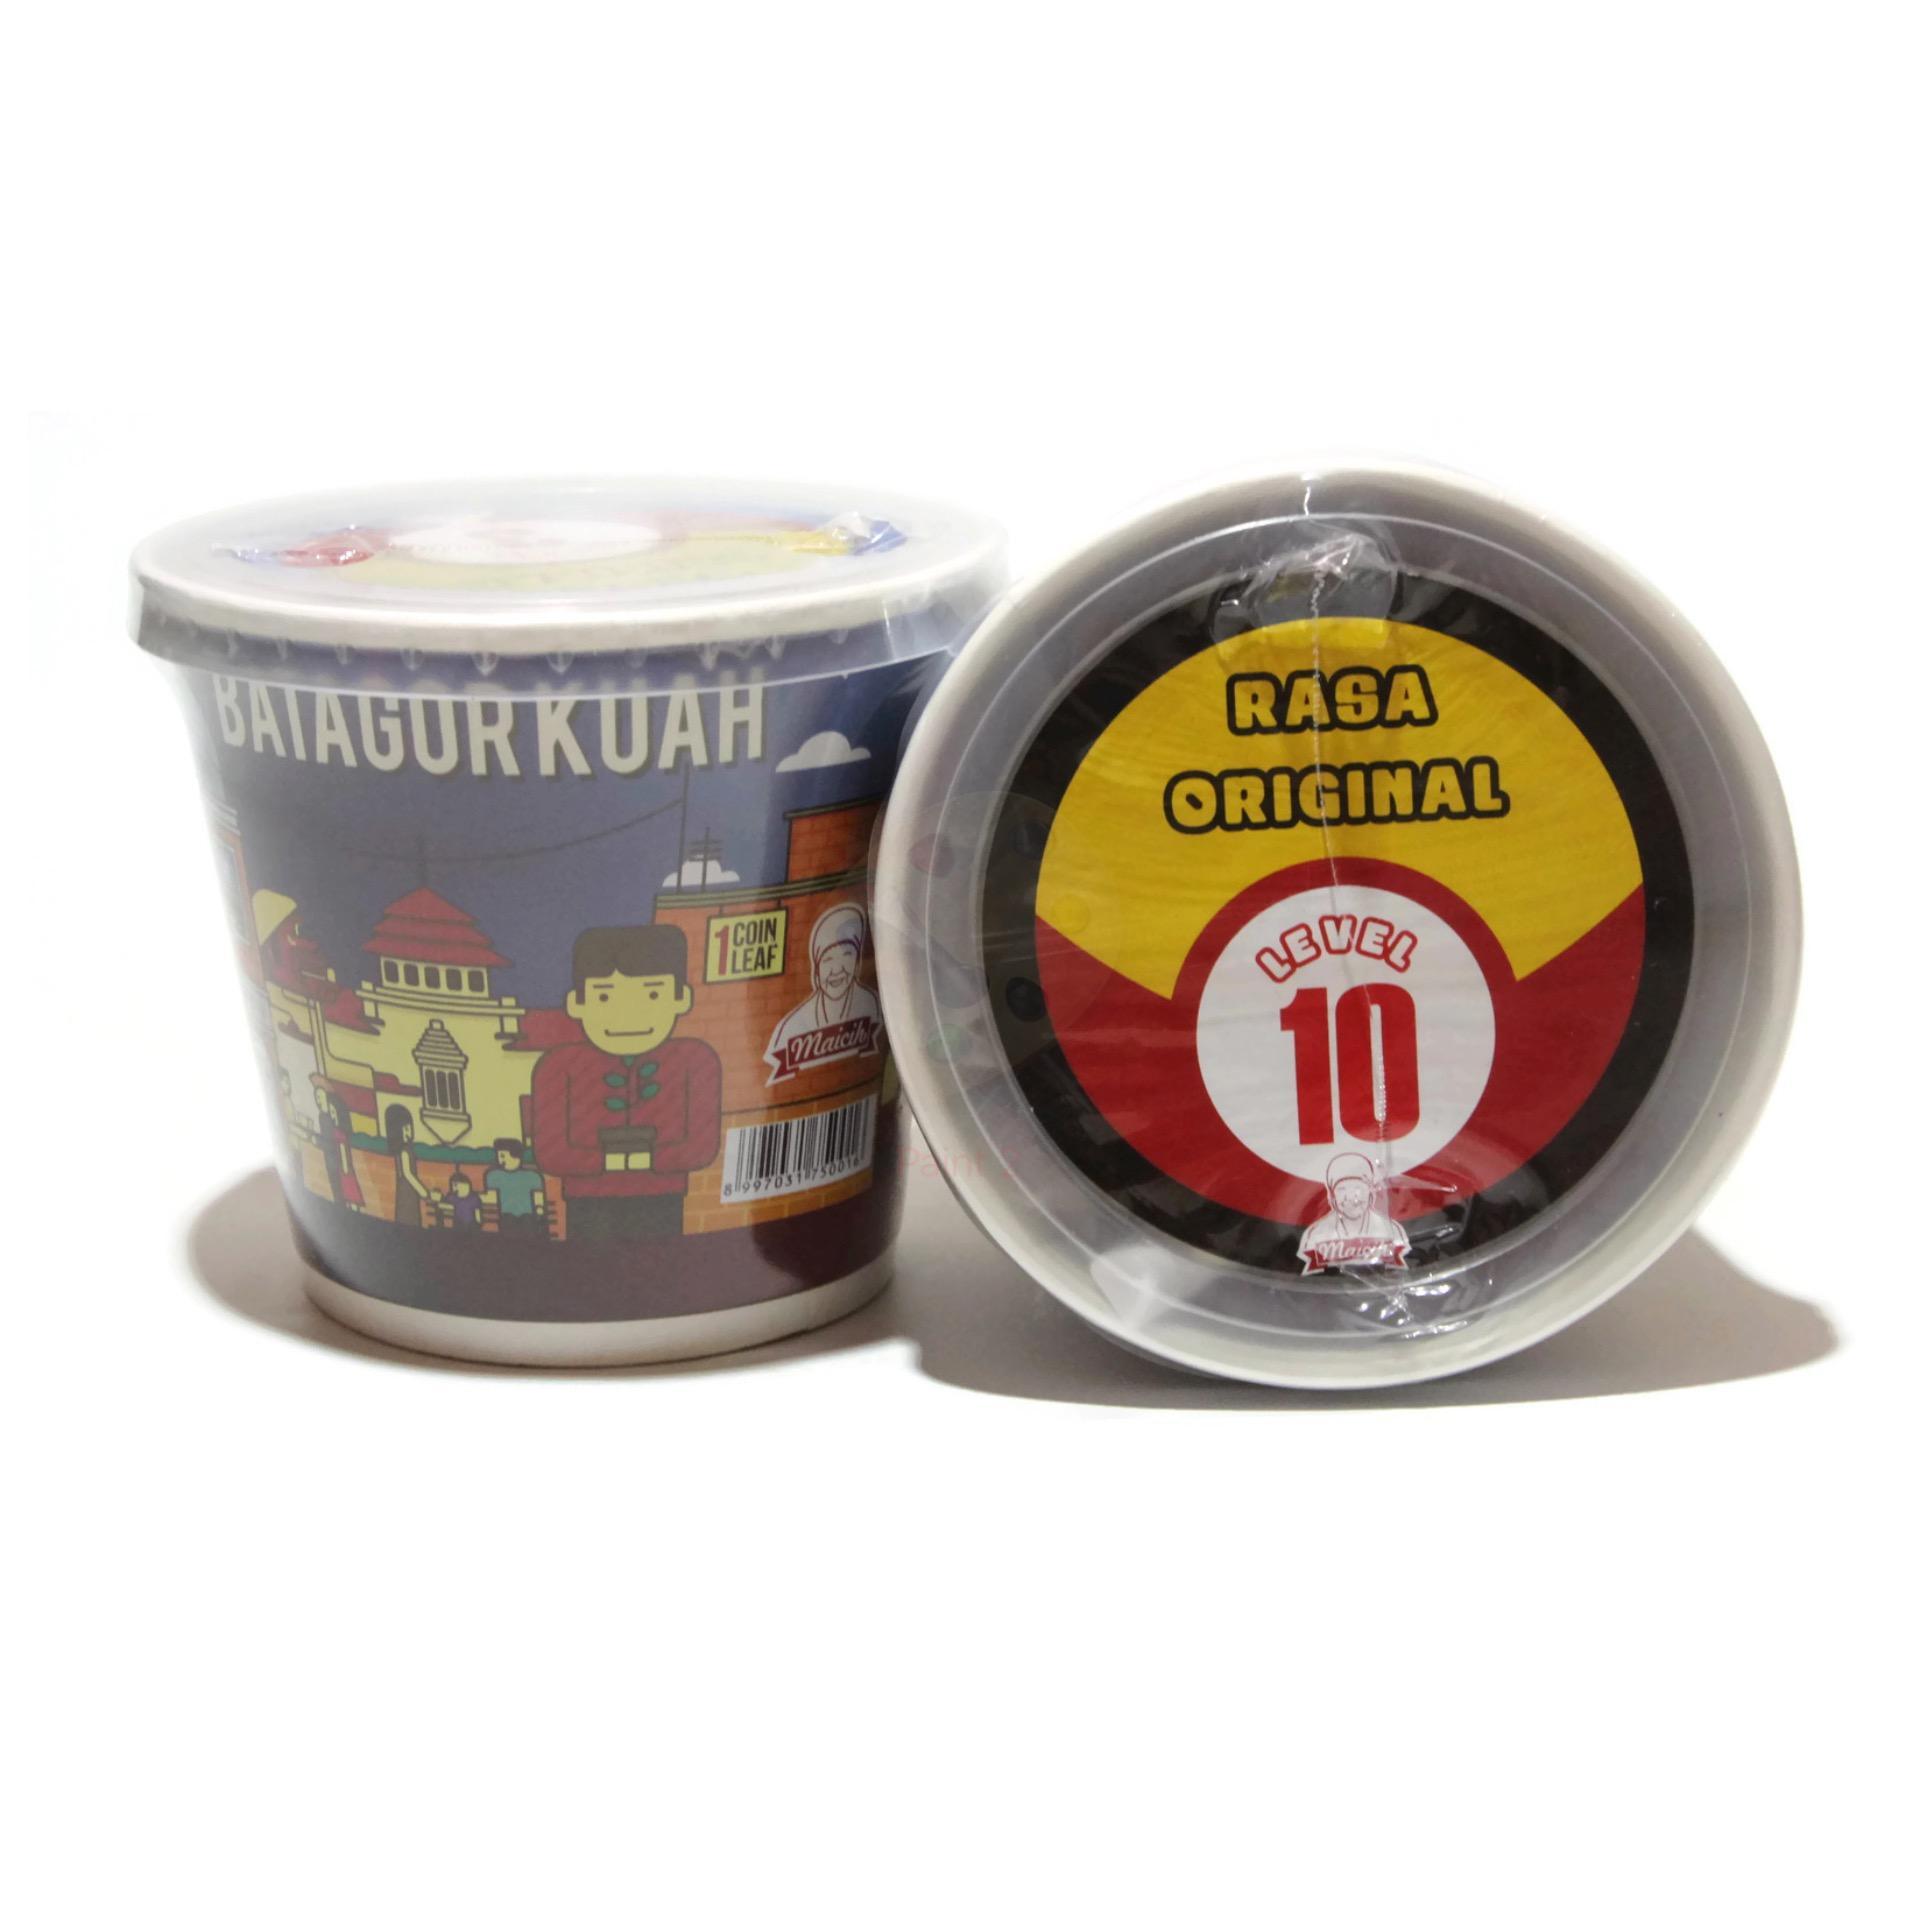 Batagor Kuah Maicih - Pedas Original Level 10 - Paket 2 Cup